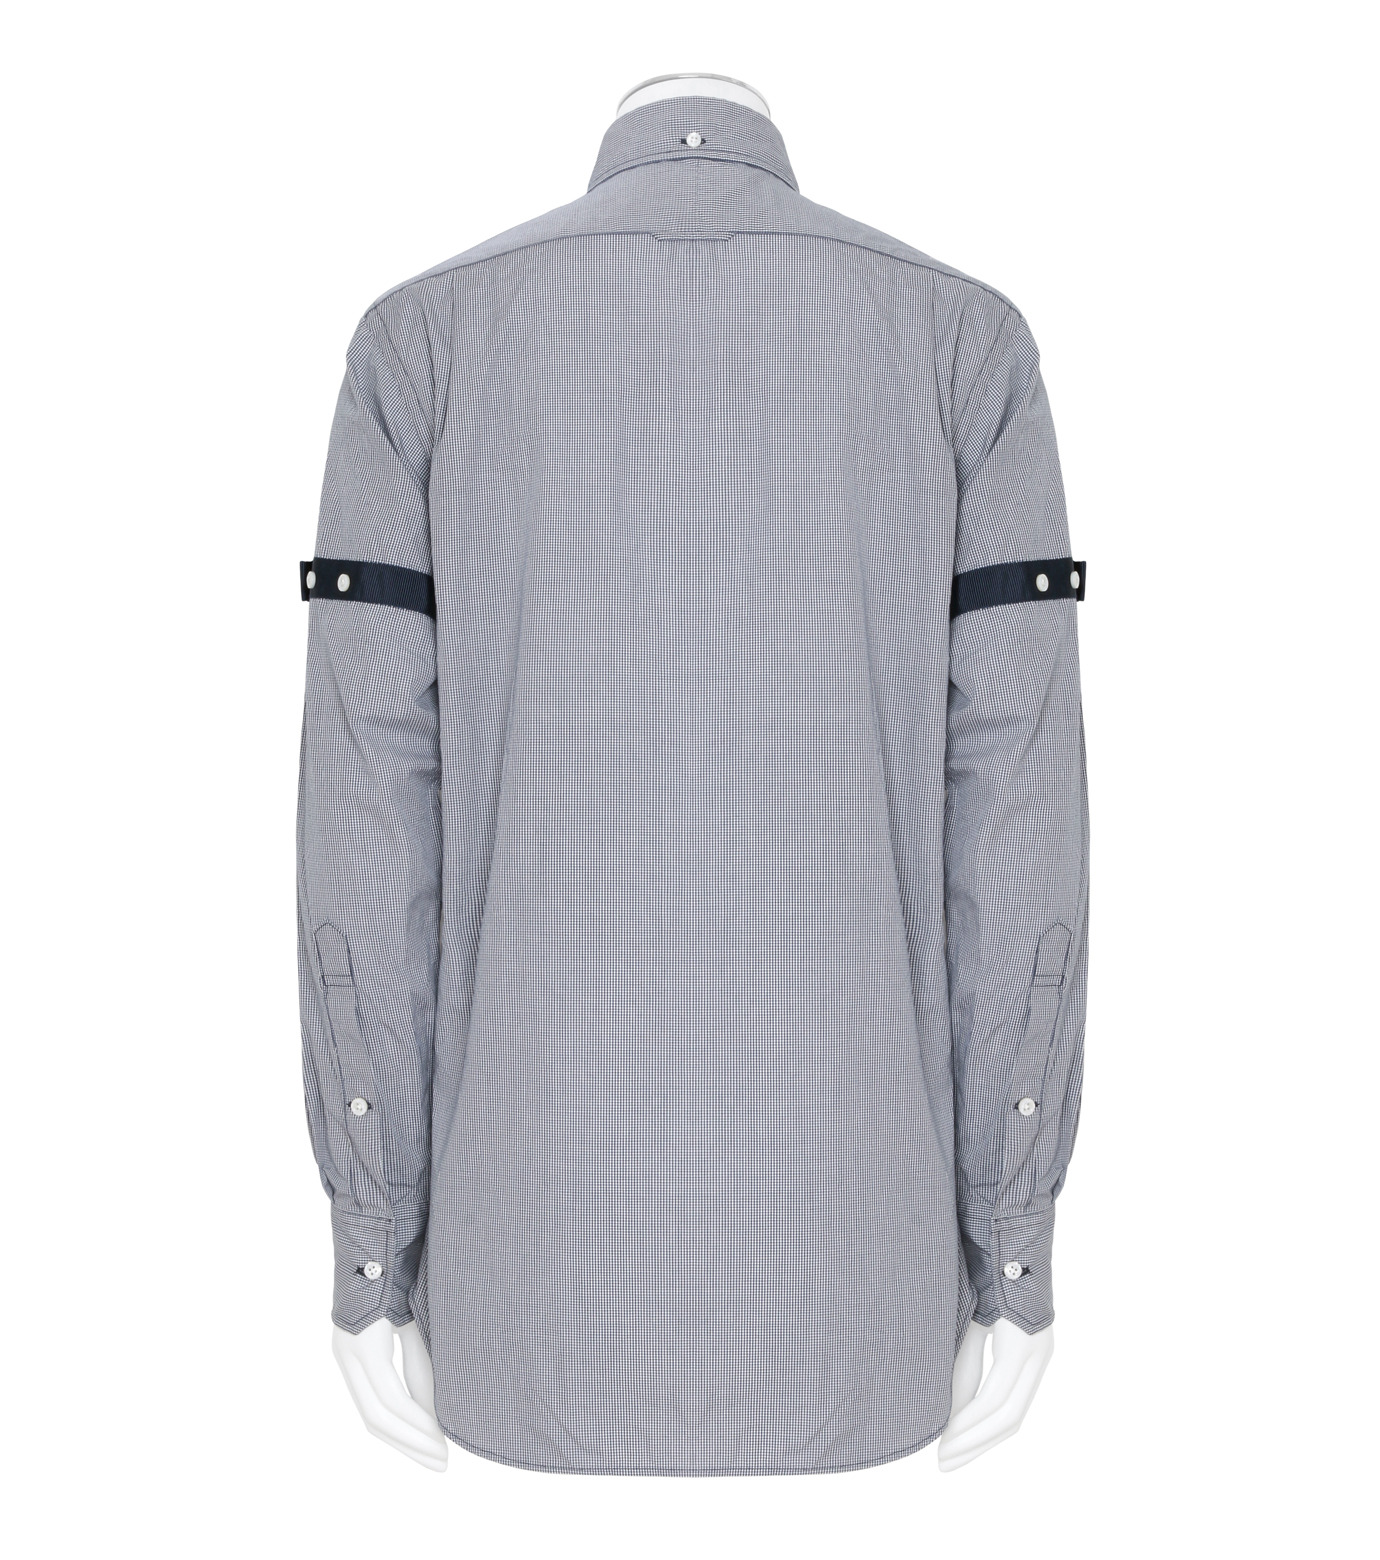 Thom Browne(トムブラウン)のArmband Check Shirt-NAVY(シャツ/shirt)-MWL150E01489-93 拡大詳細画像2